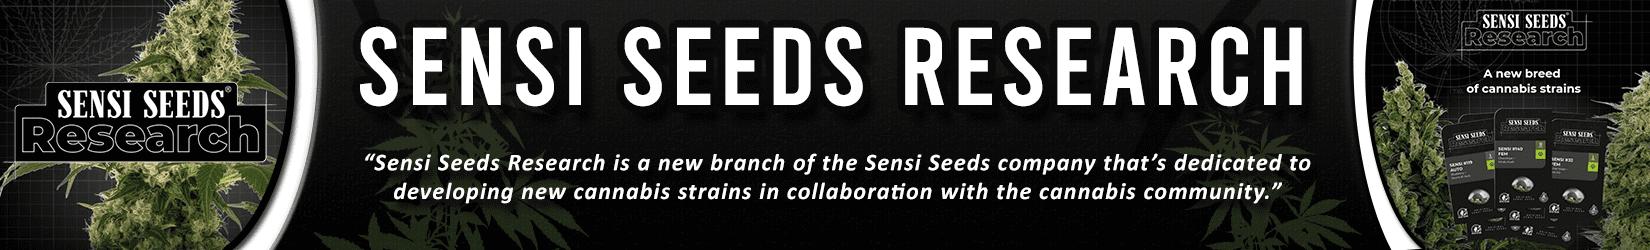 Cannabis Seeds Breeder - Sensi Seeds Research